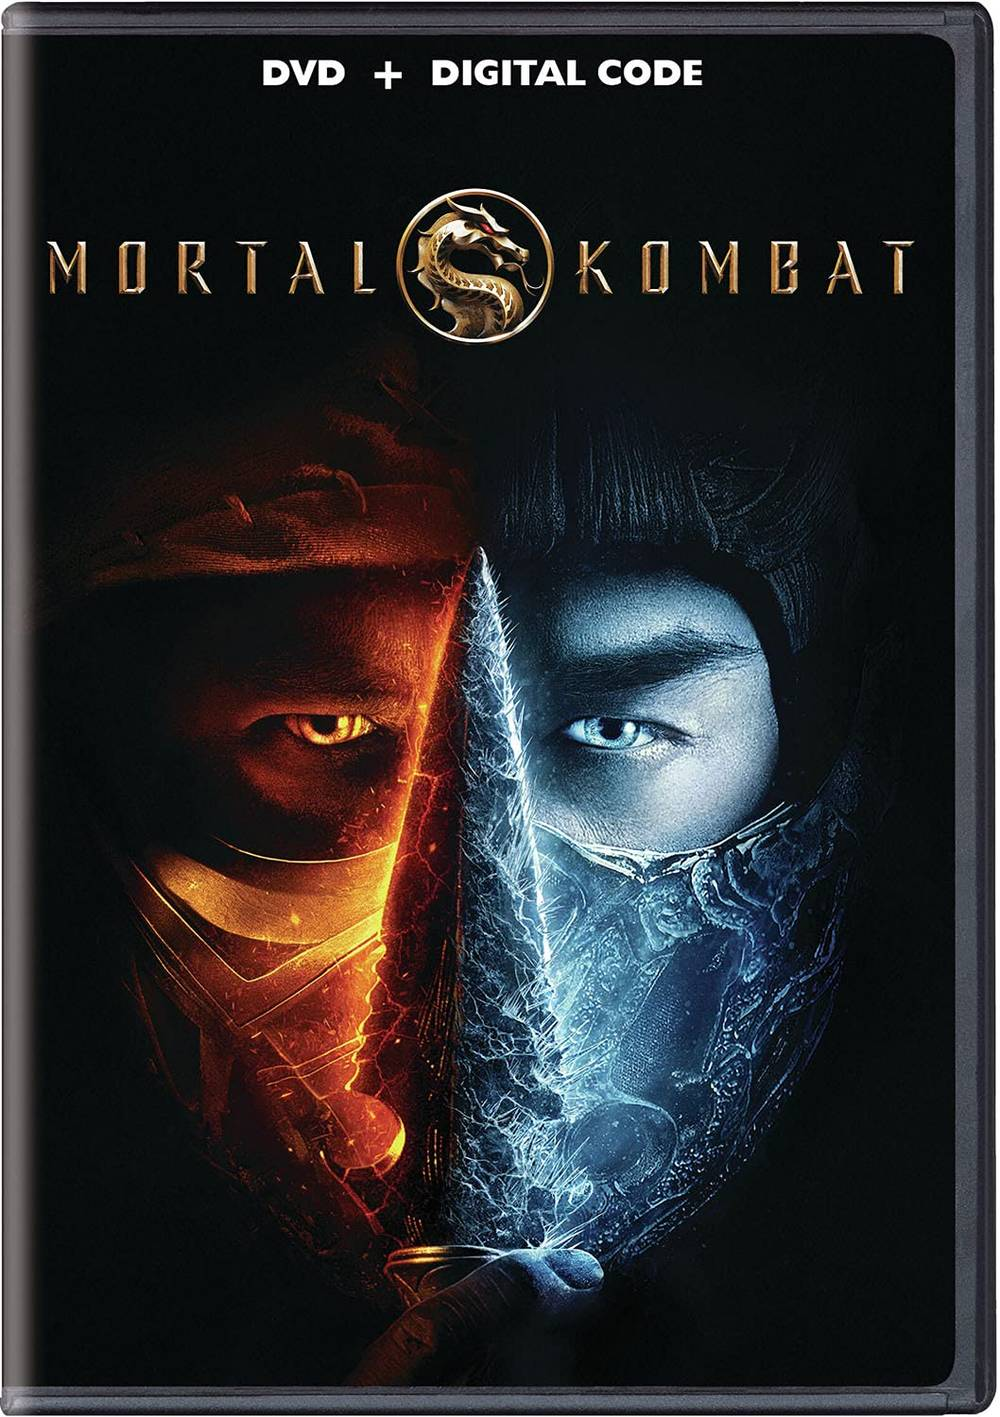 Mortal Kombat [Movie] - Mortal Kombat